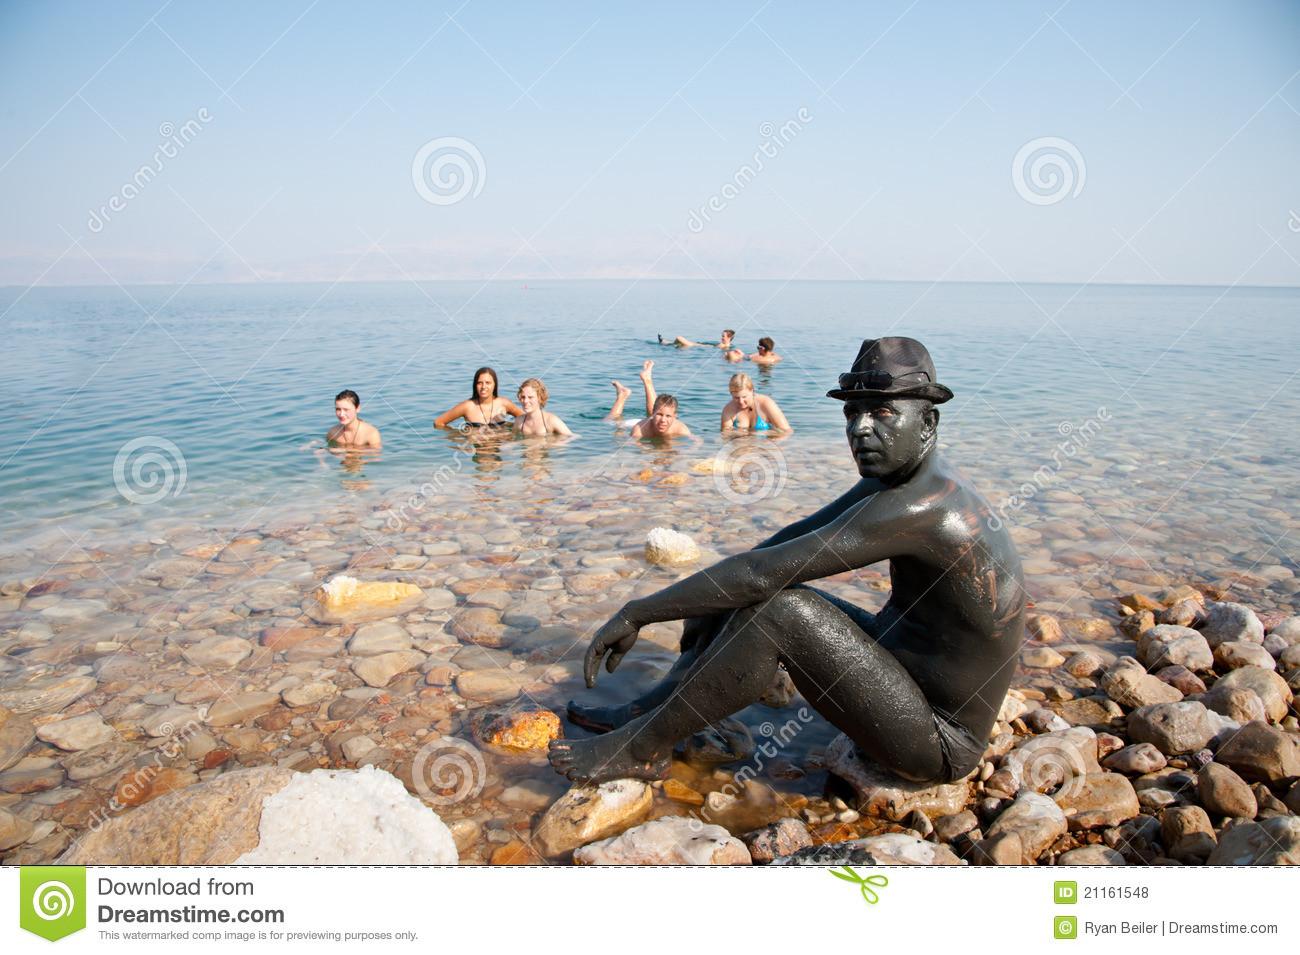 SY dead-sea-mud-lovers-21161548.jpg